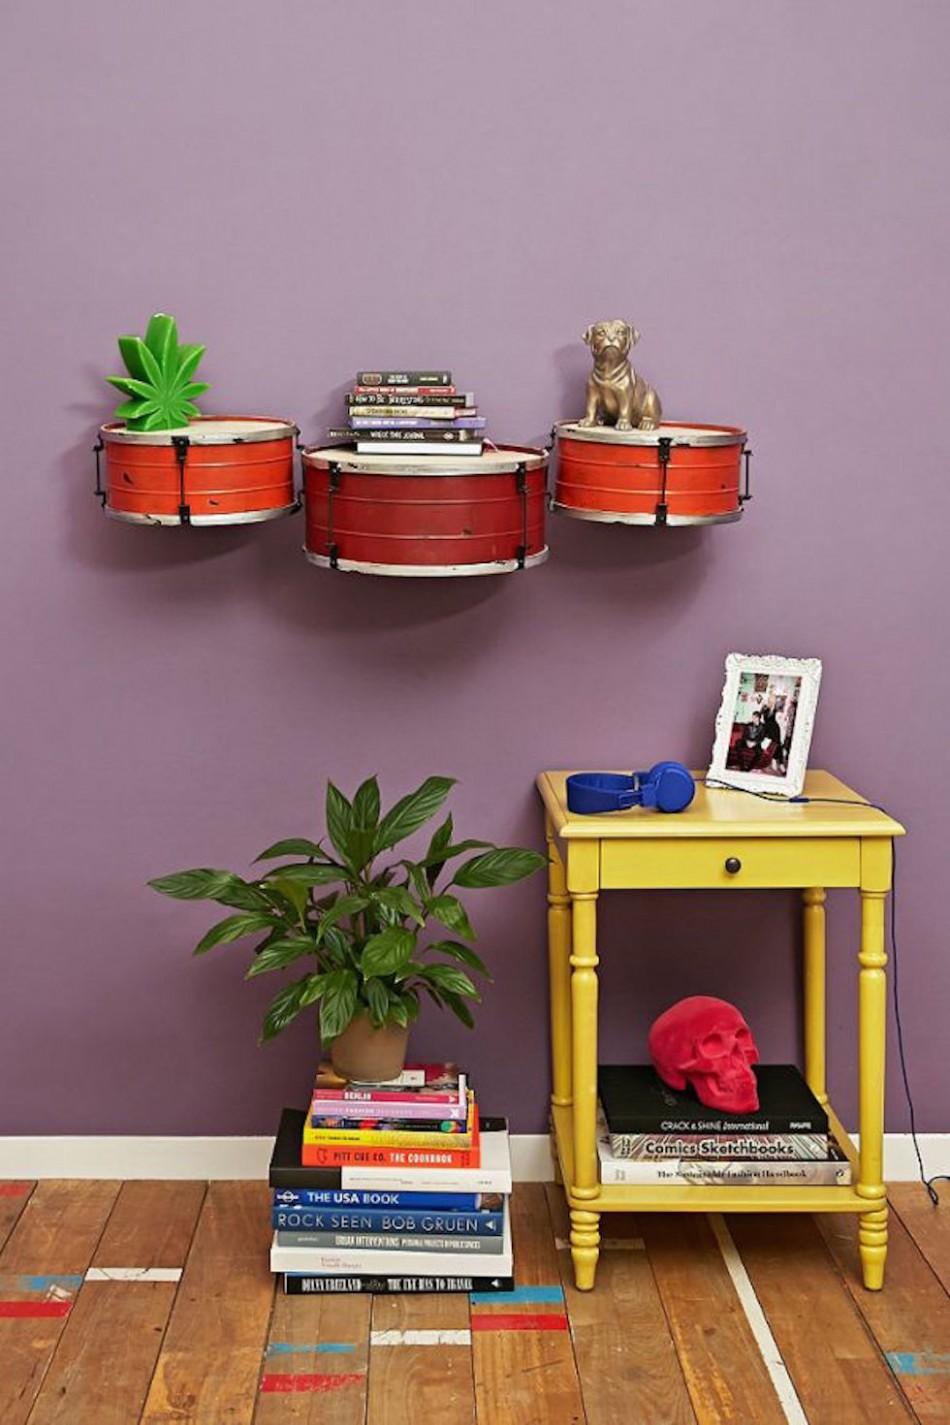 Interior design inspired by Music Interior design inspired by Music Drum shelves e1441191025561